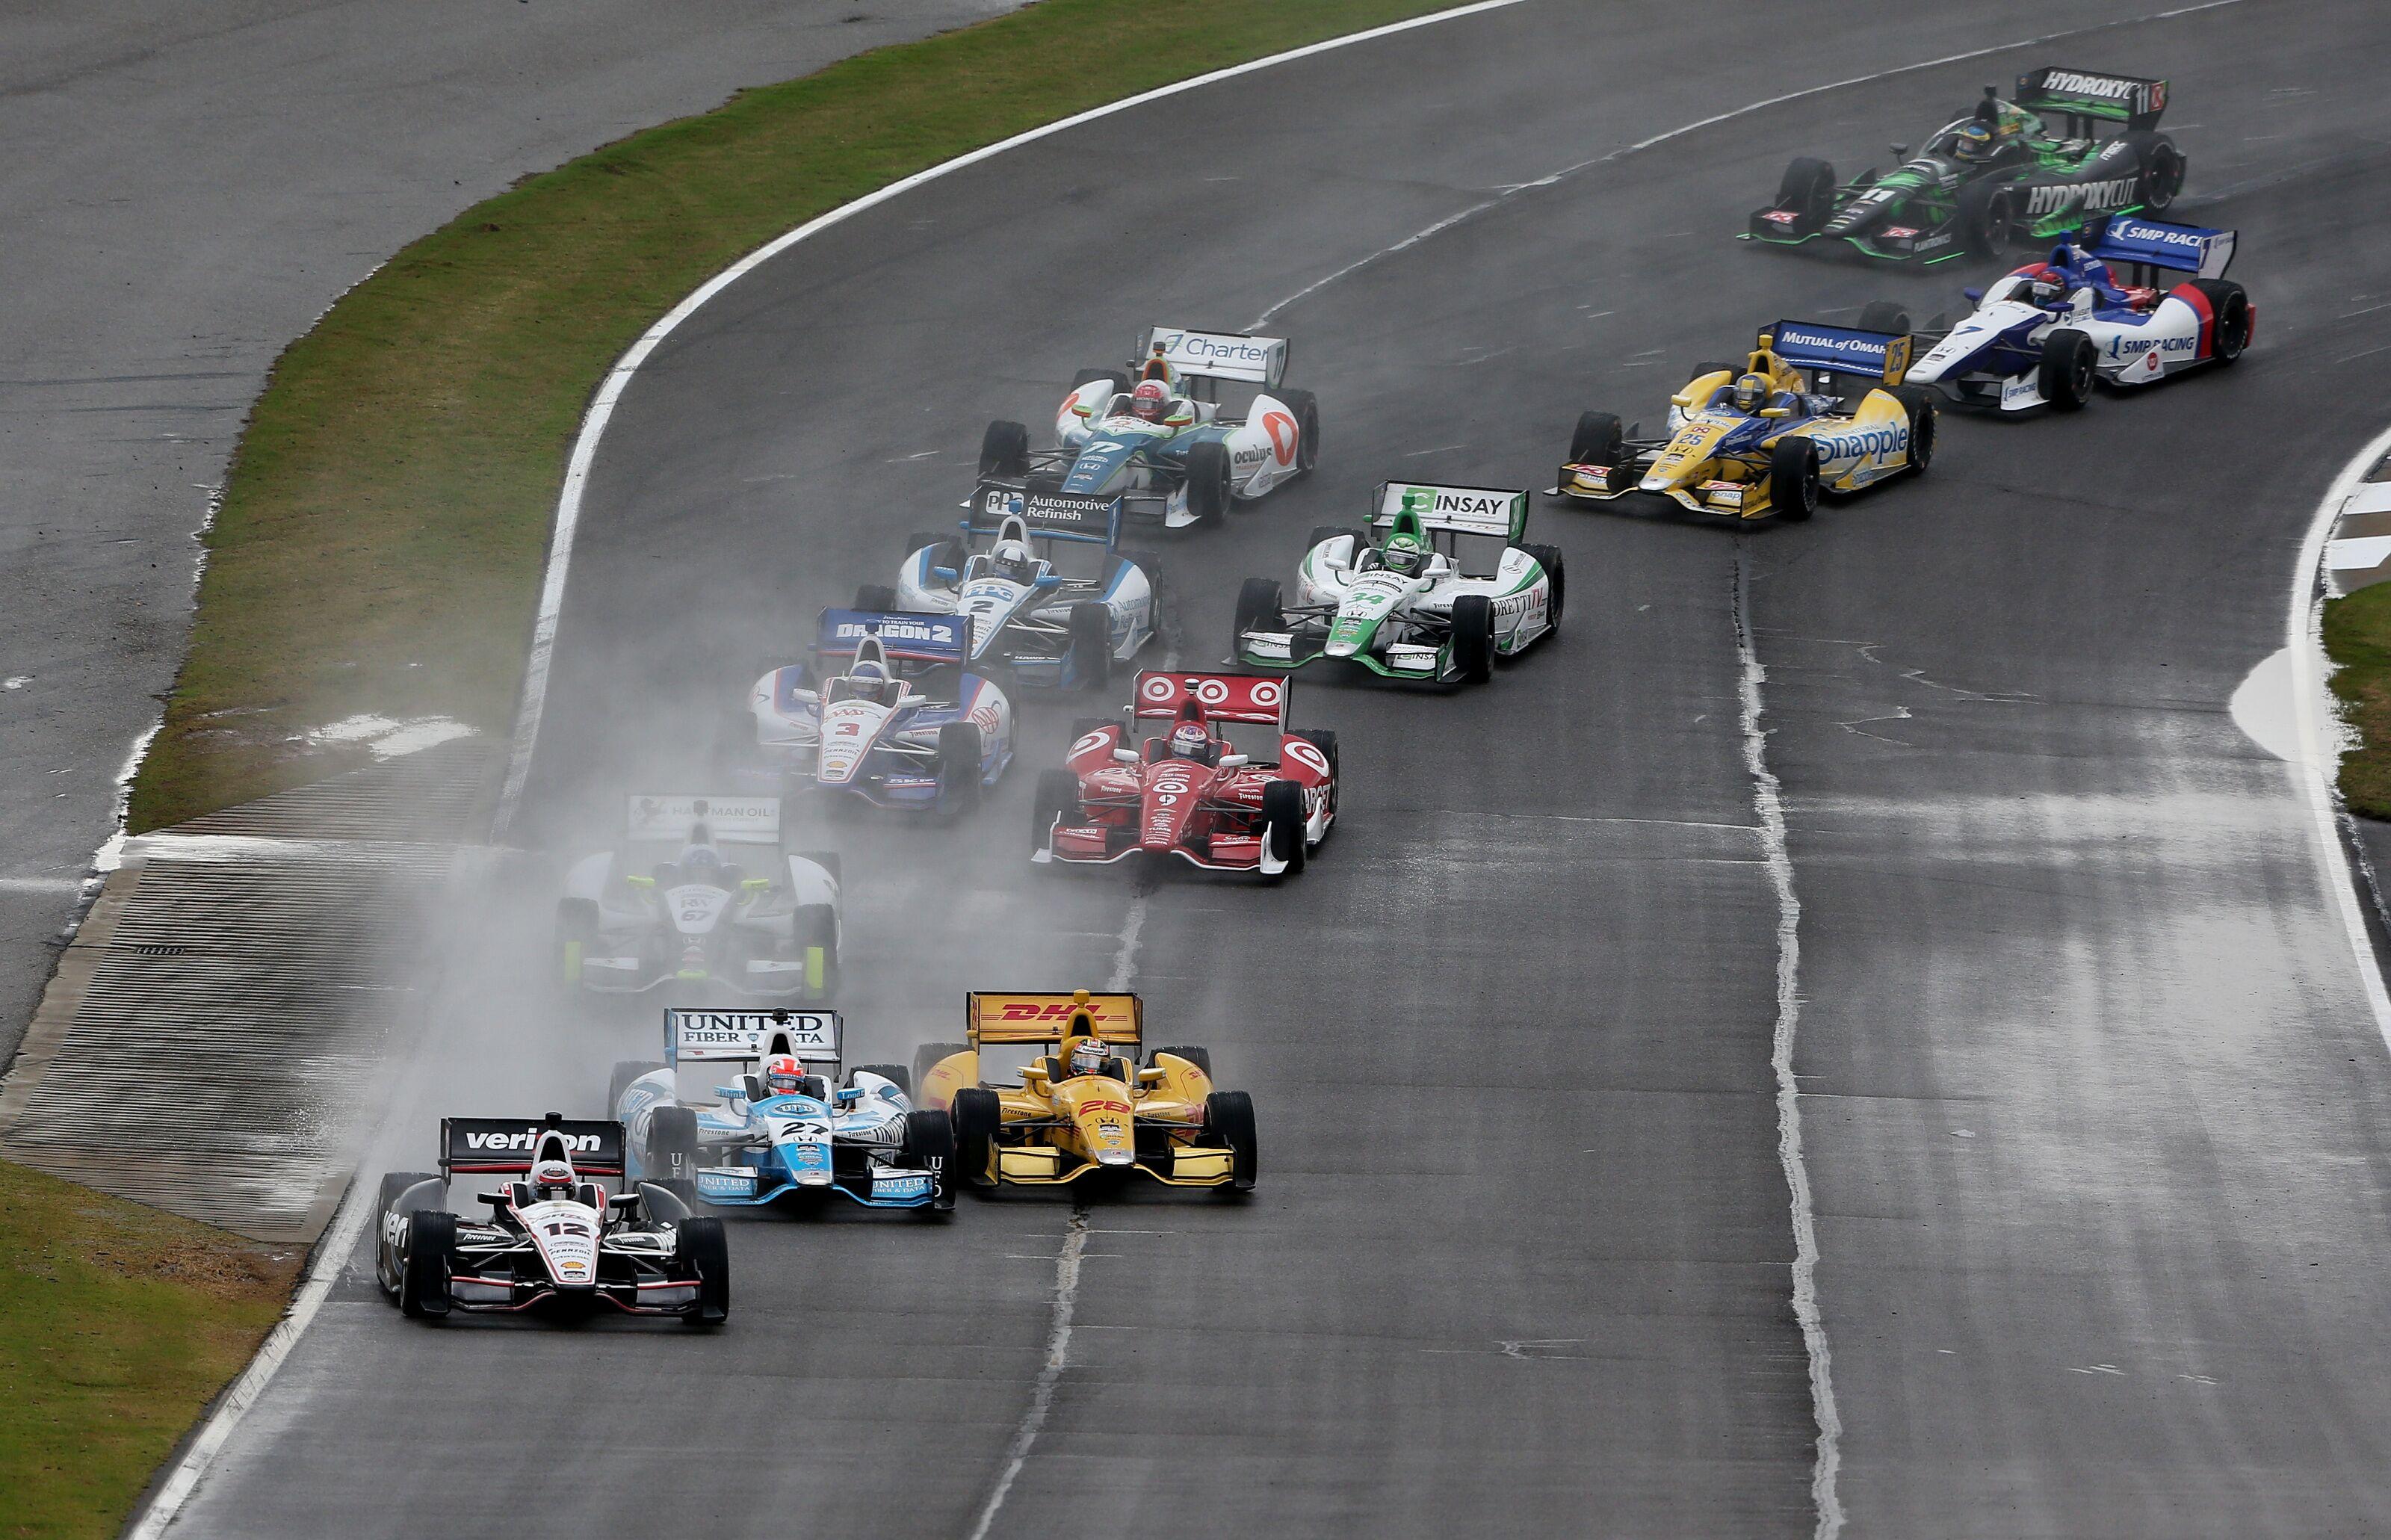 IndyCar: 2018 Honda Indy Grand Prix Of Alabama Entry List